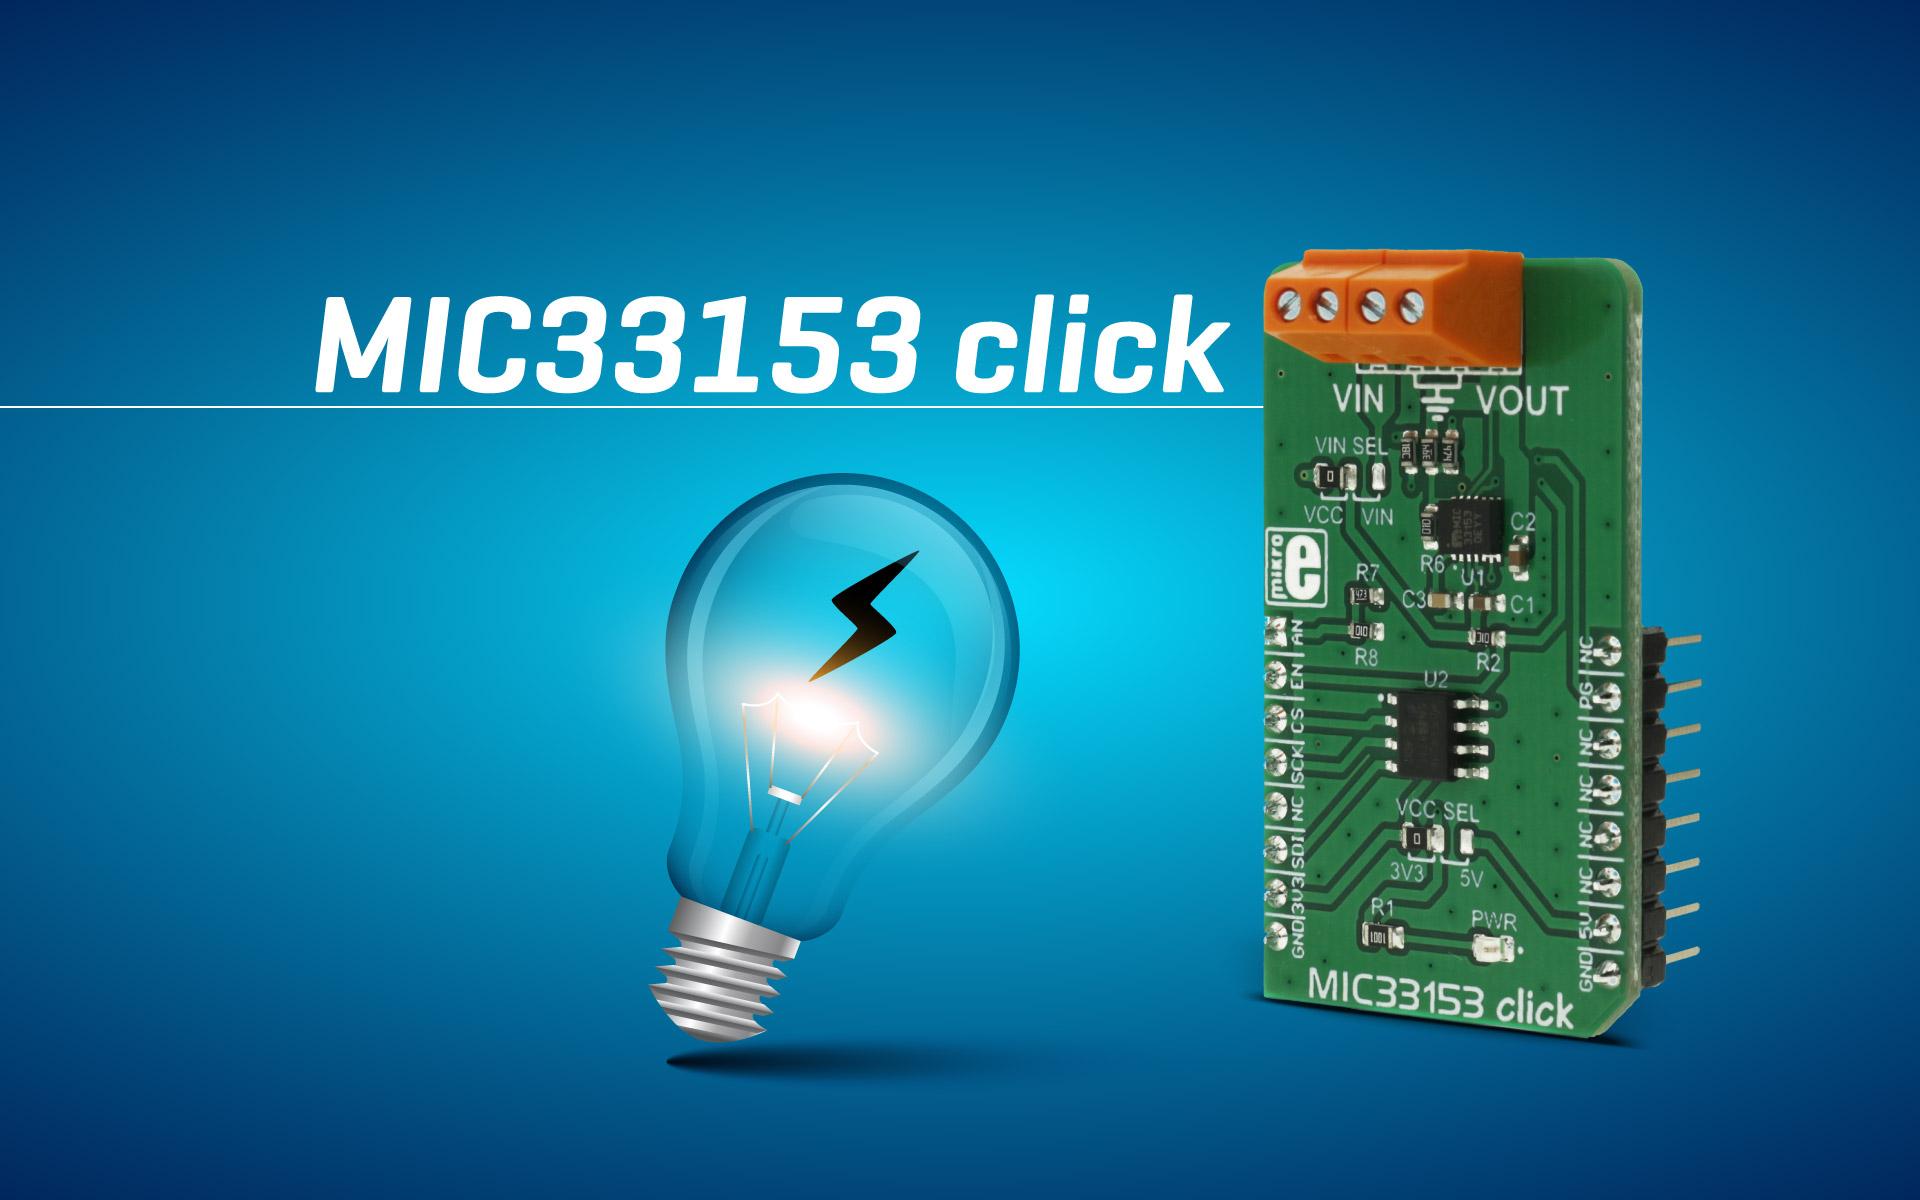 MIC33153 click - DC-DC adjustable step-down (buck) converter